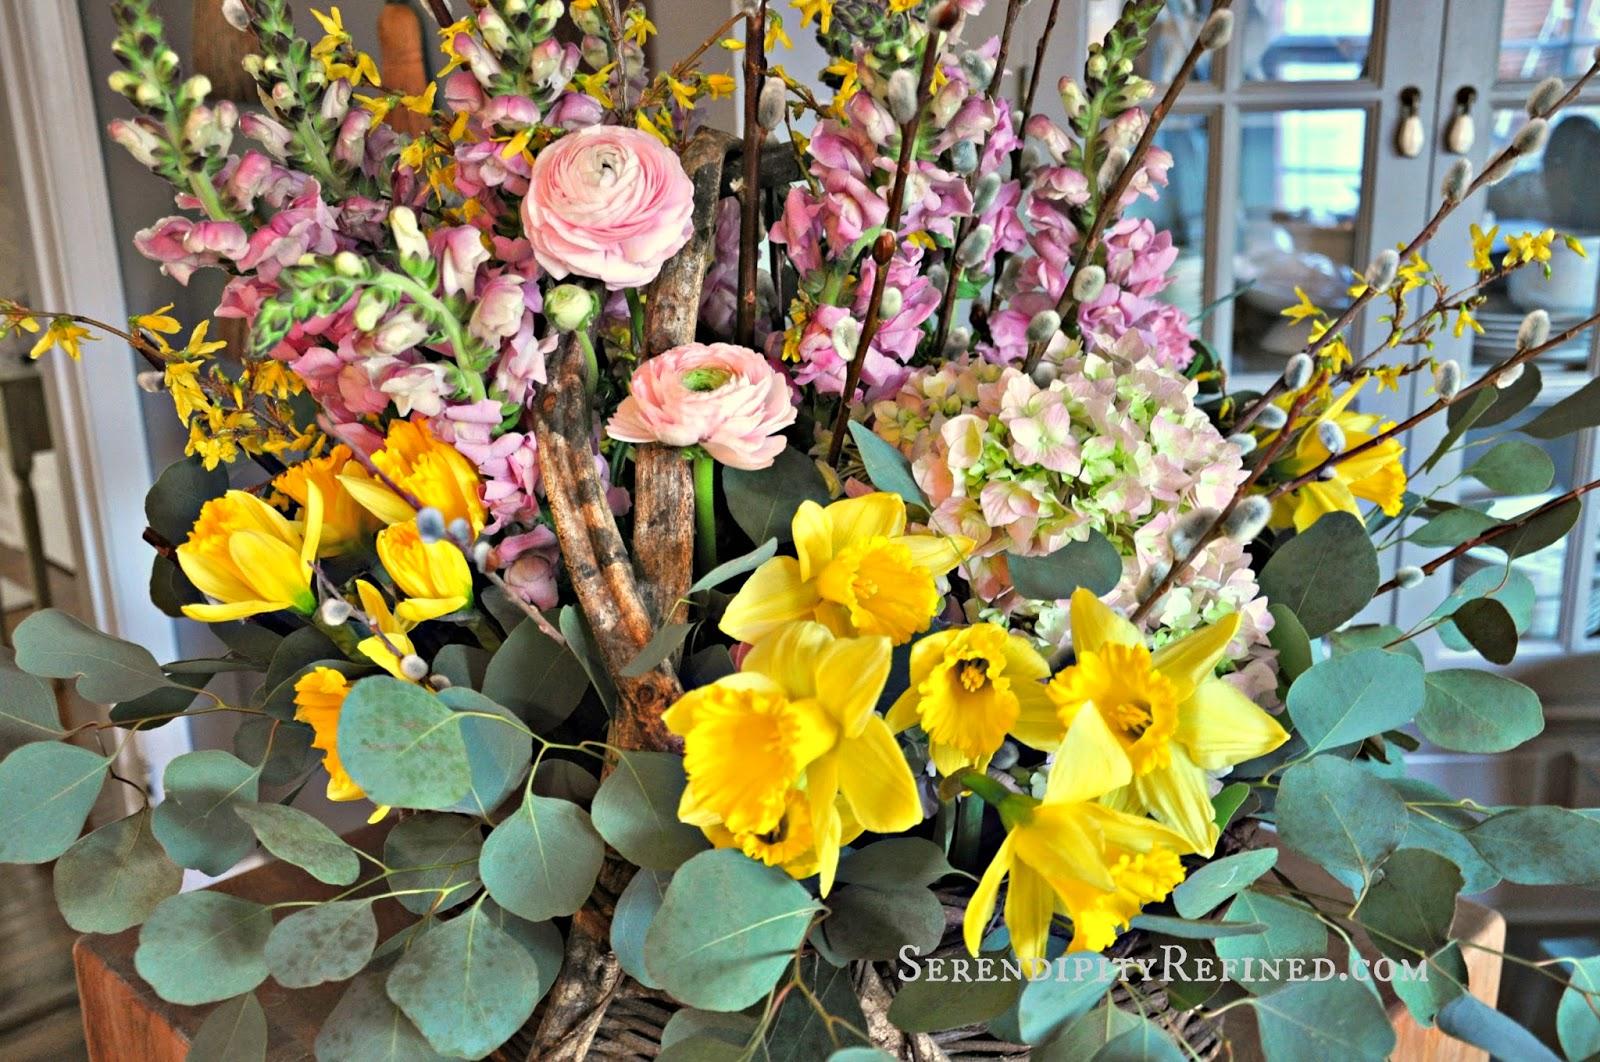 Serendipity Refined Blog Spring Flower Basket Easter Table Centerpiece